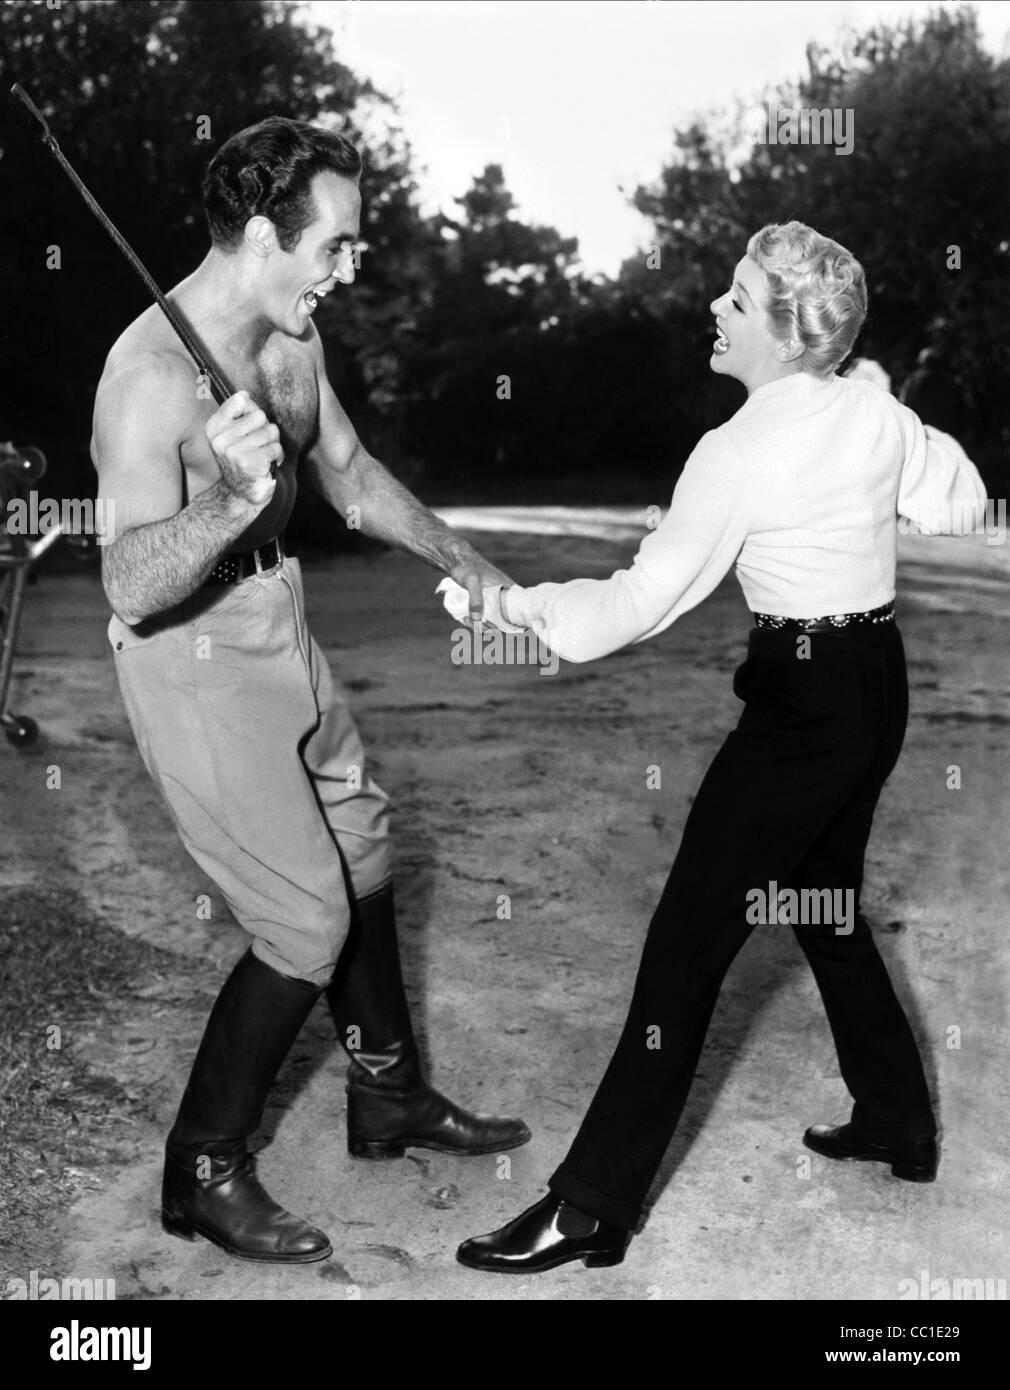 RICARDO MONTALBAN, Lana Turner, de l'amoureux, 1953 Photo Stock